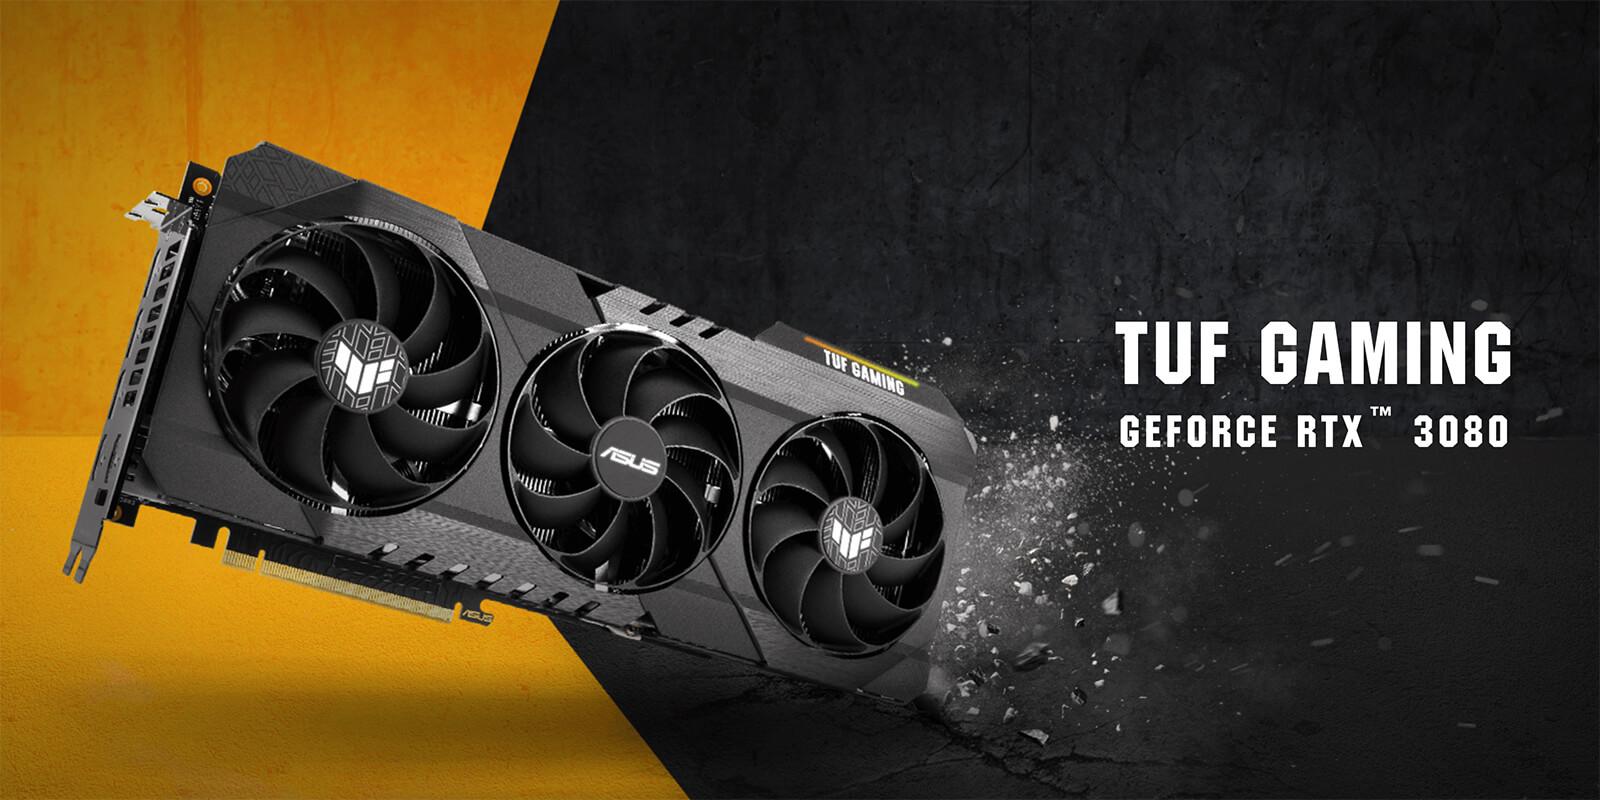 Asus Tuf Gaming Geforce Rtx 3080 10gb Gddr6x Featured